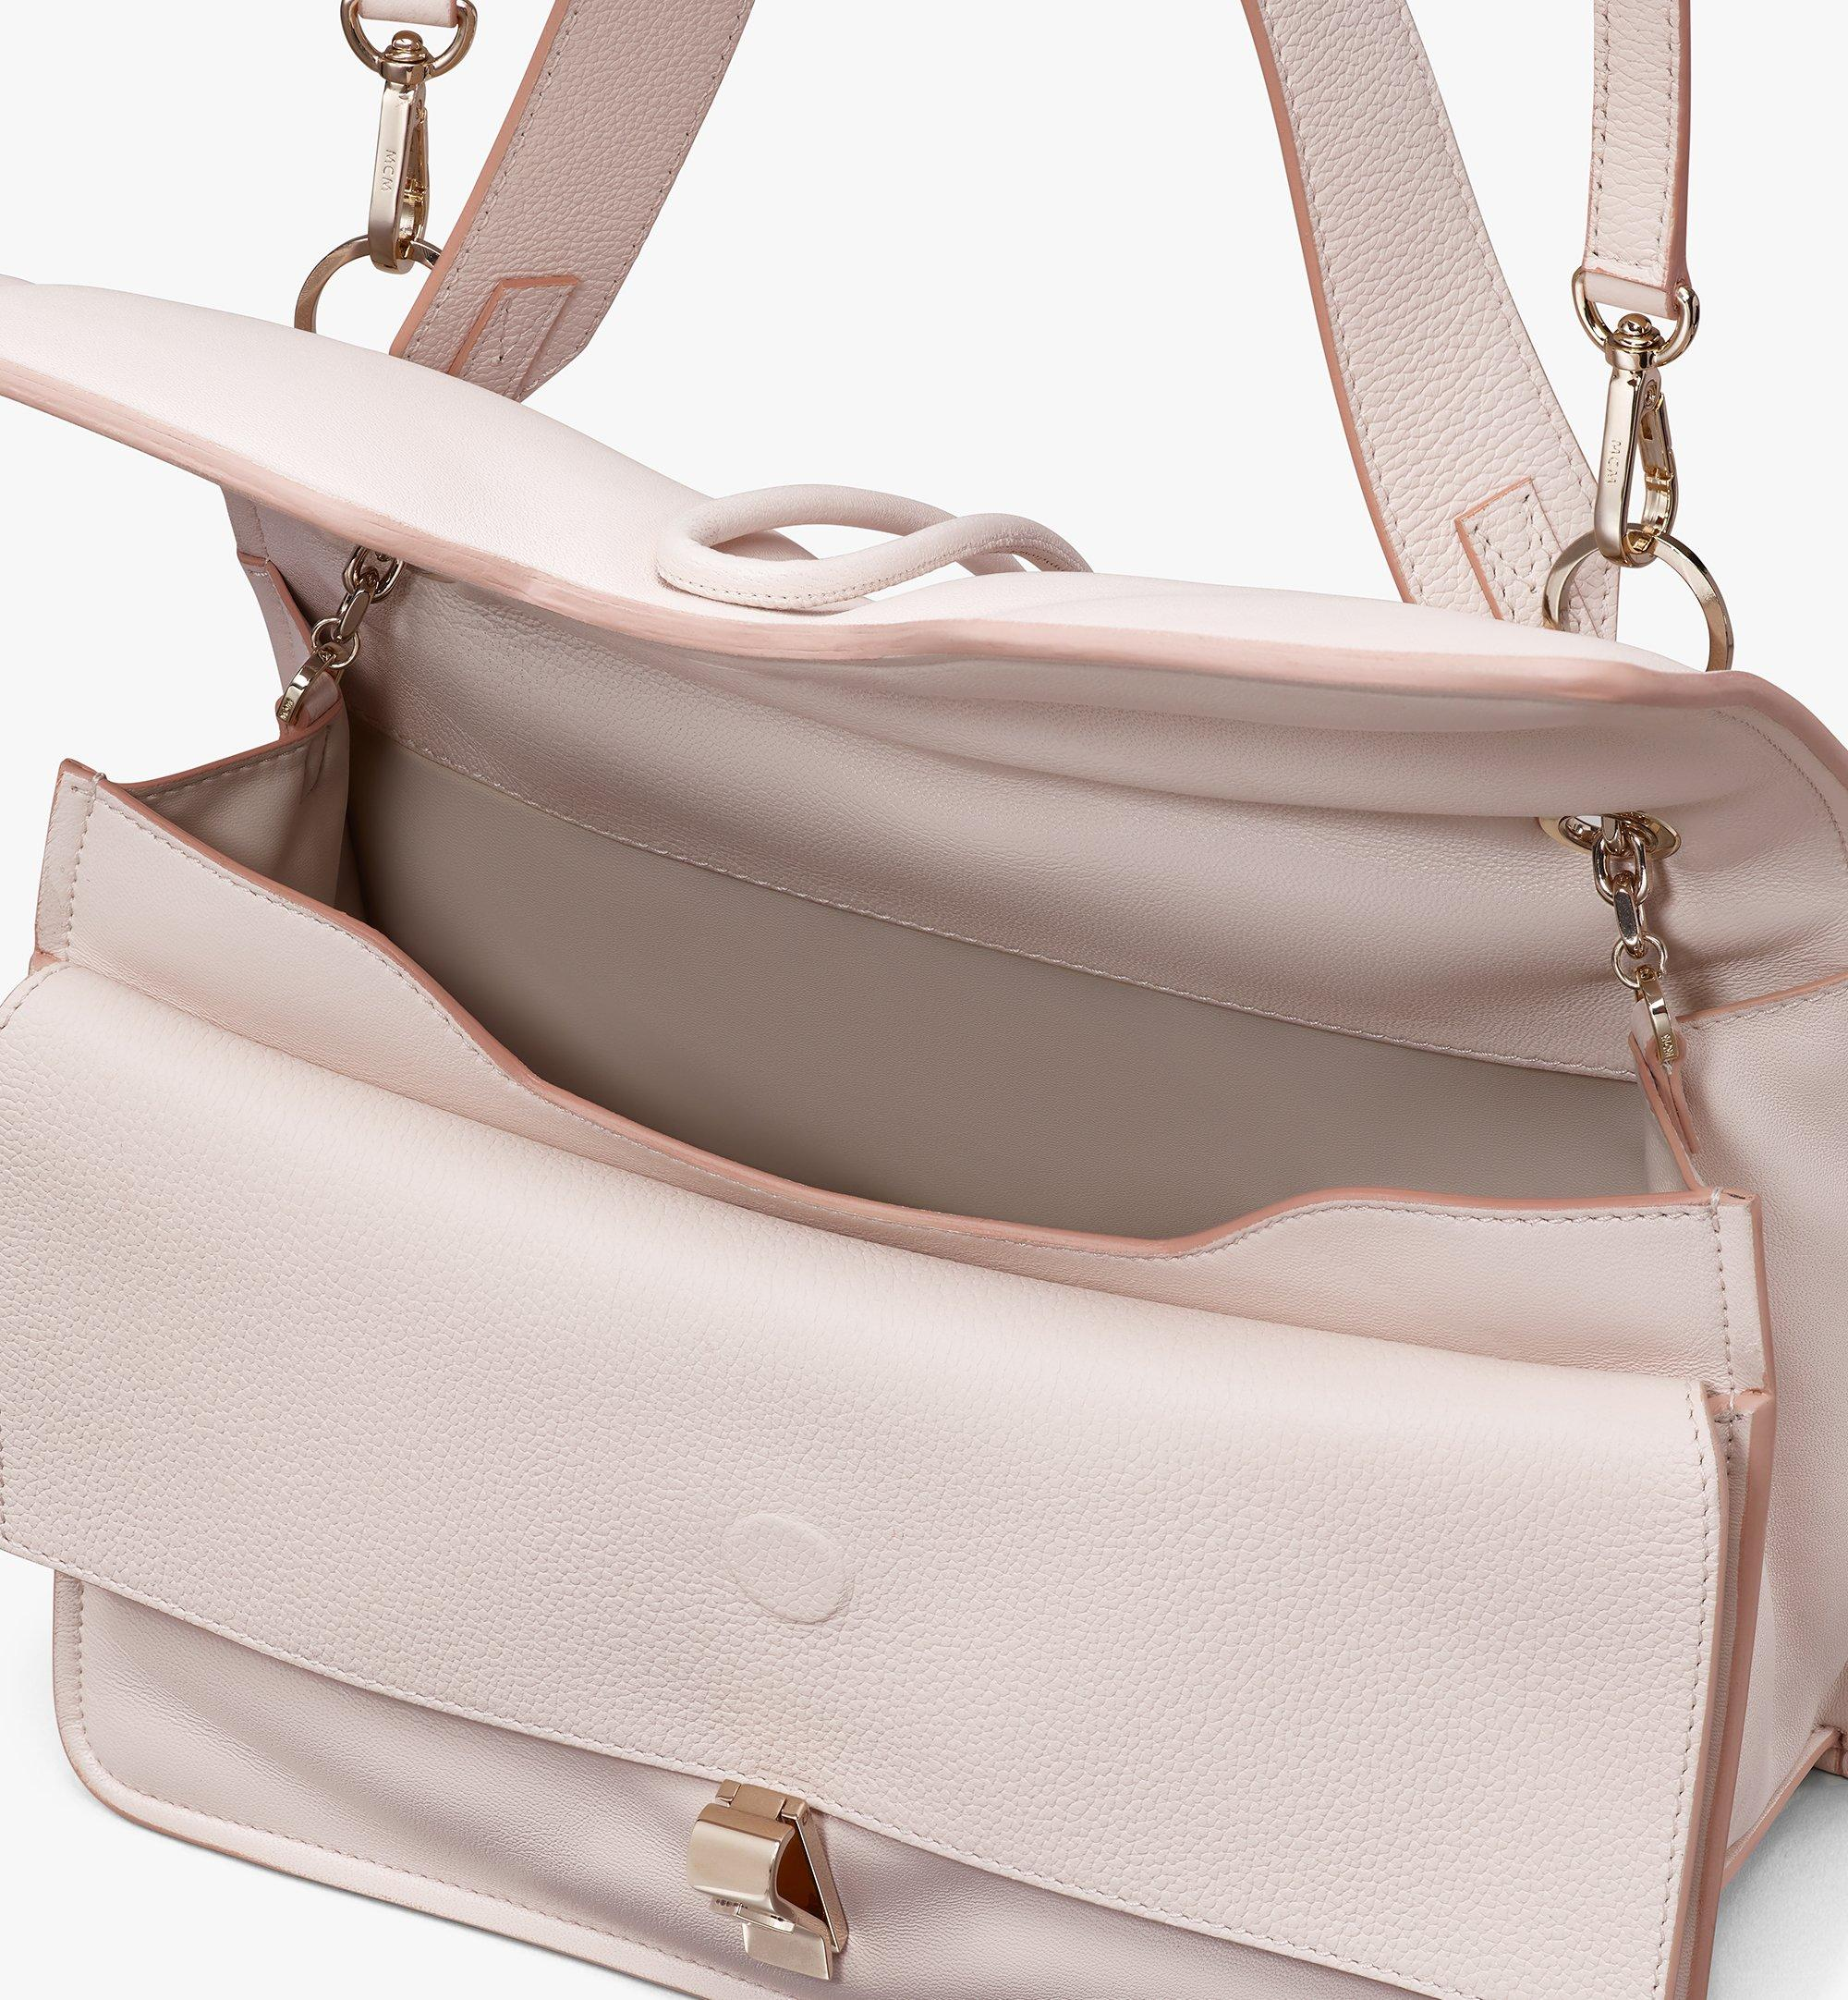 MCM Candy Shoulder Bag in Nappa Leather Beige MWSASCY04IH001 Alternate View 3